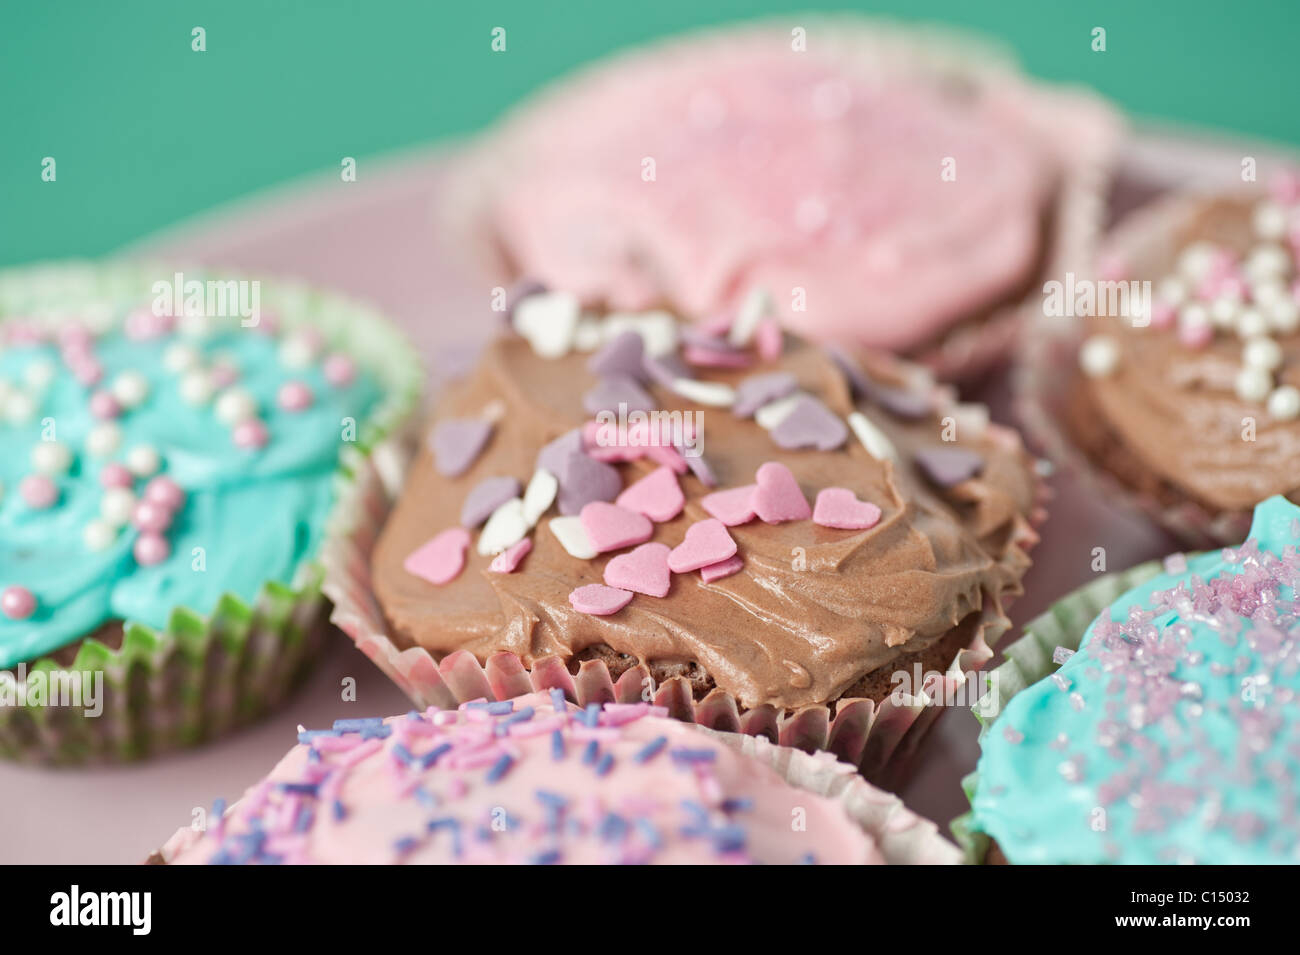 Closeup on cupcakes - Stock Image